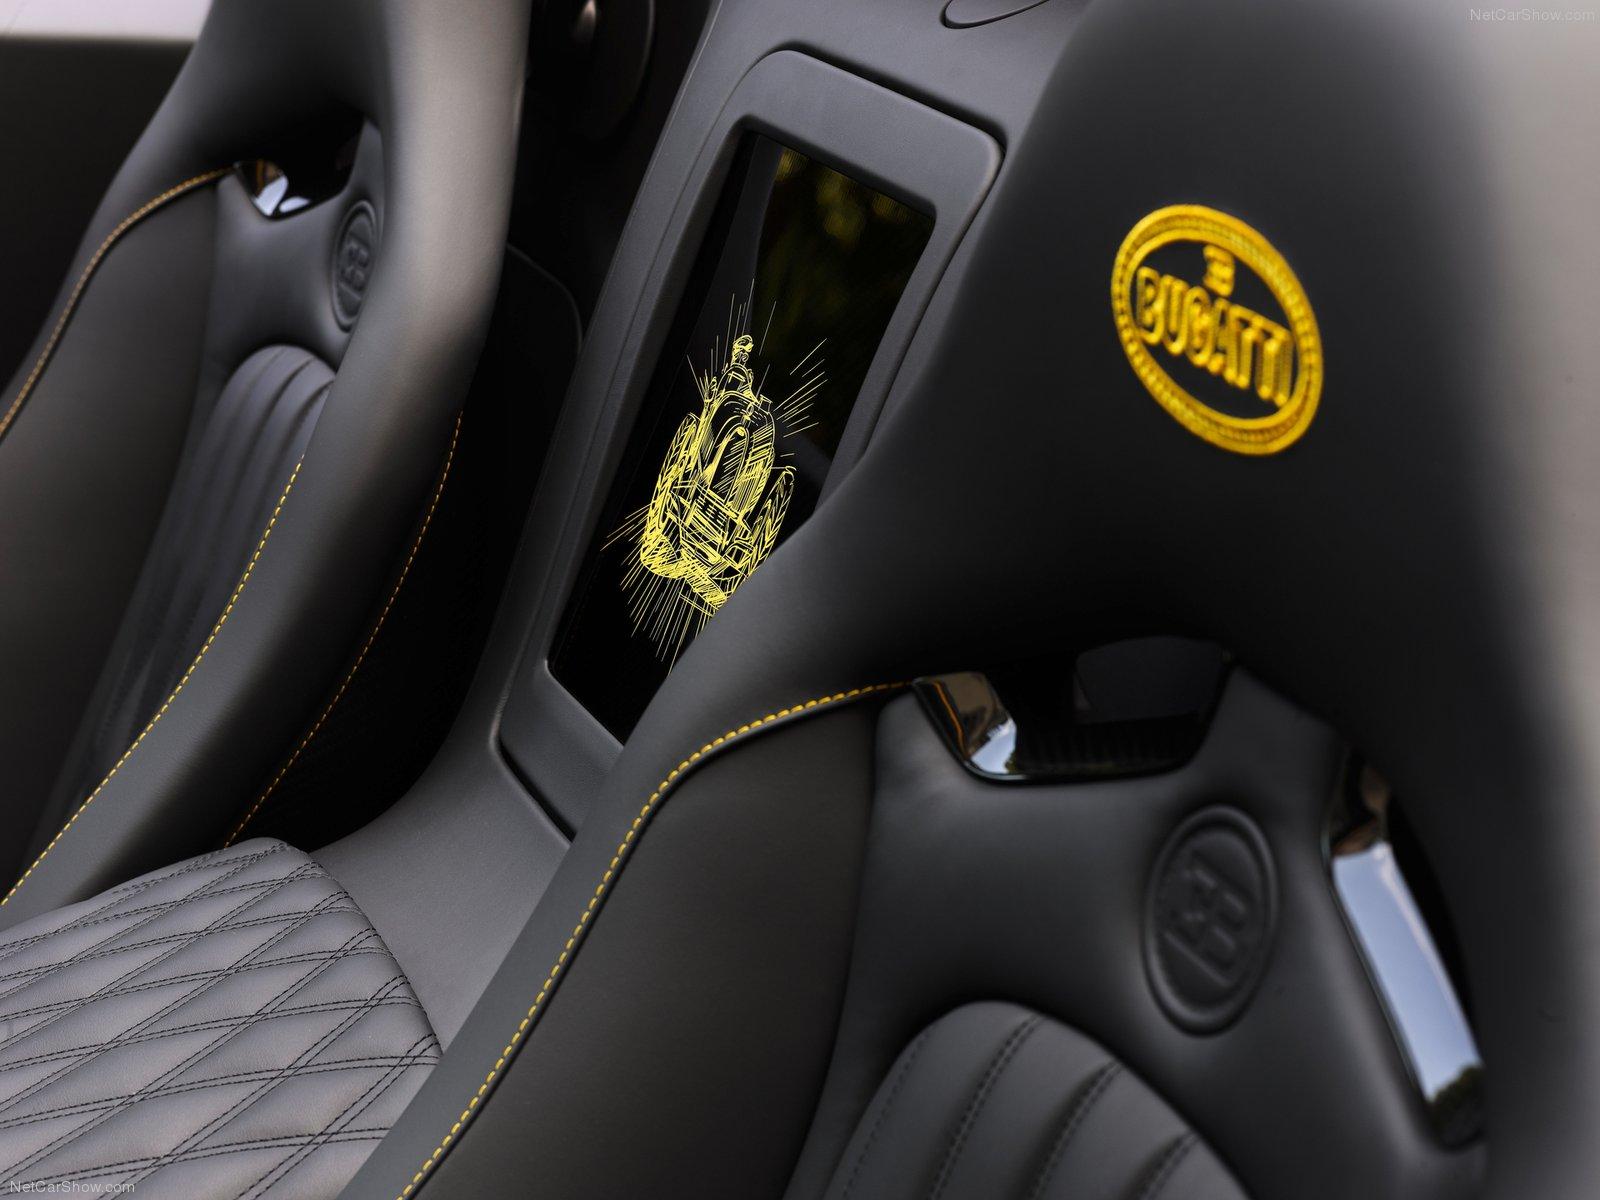 bugatti veyron grand sport vitesse 1of1 photos photogallery with 11 pics. Black Bedroom Furniture Sets. Home Design Ideas